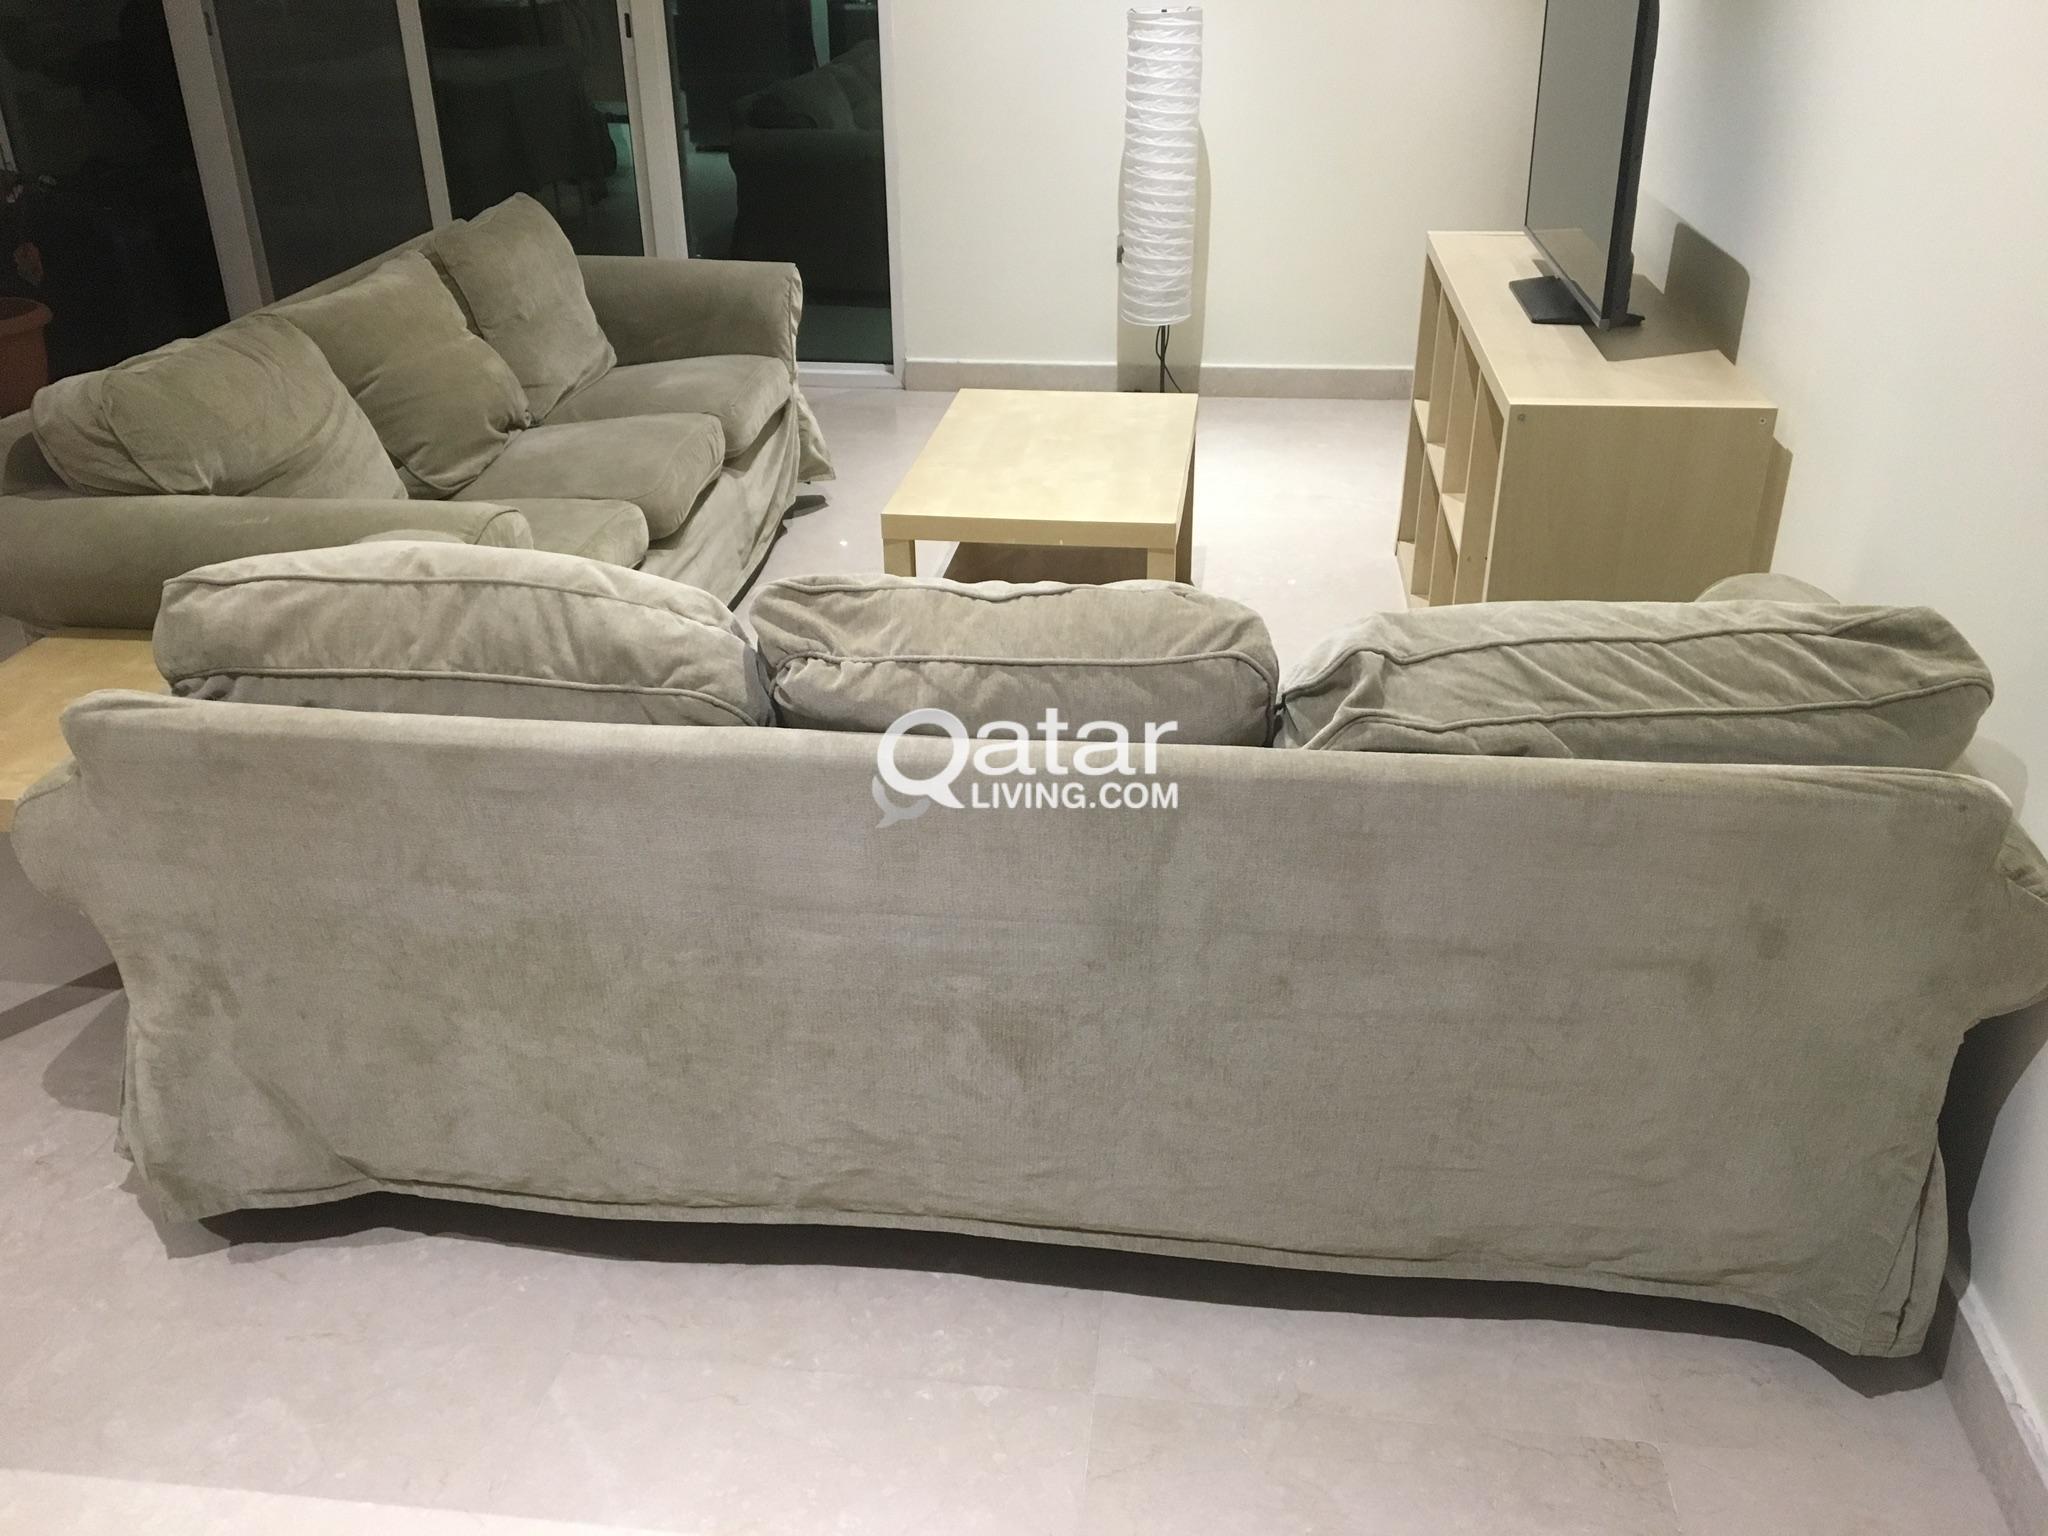 Sensational Ikea Ektorp Sofa Cover Is On Sale Qatar Living Frankydiablos Diy Chair Ideas Frankydiabloscom